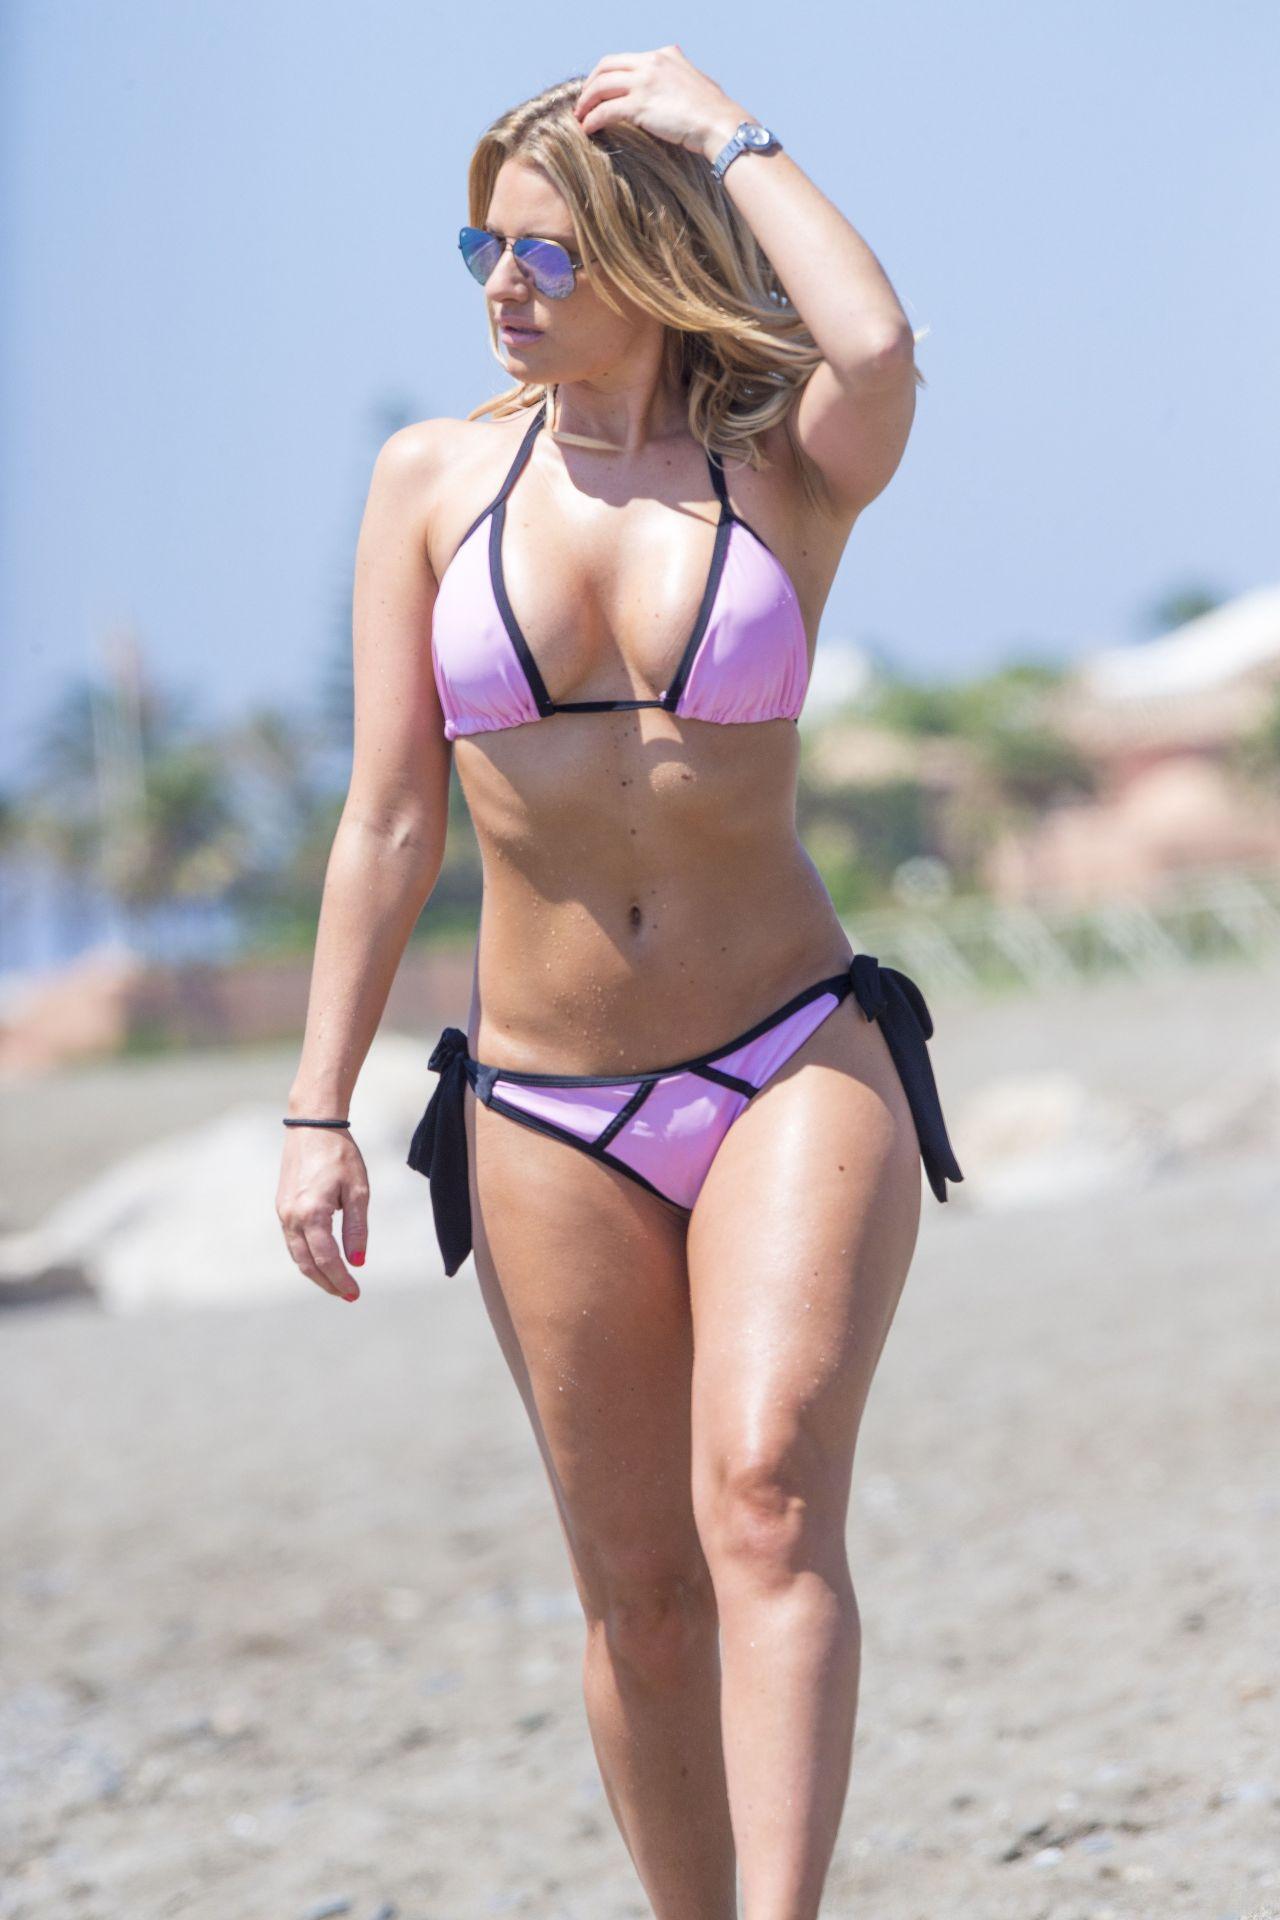 danielle armstrong bikini beach marbella june wearing gotceleb posted